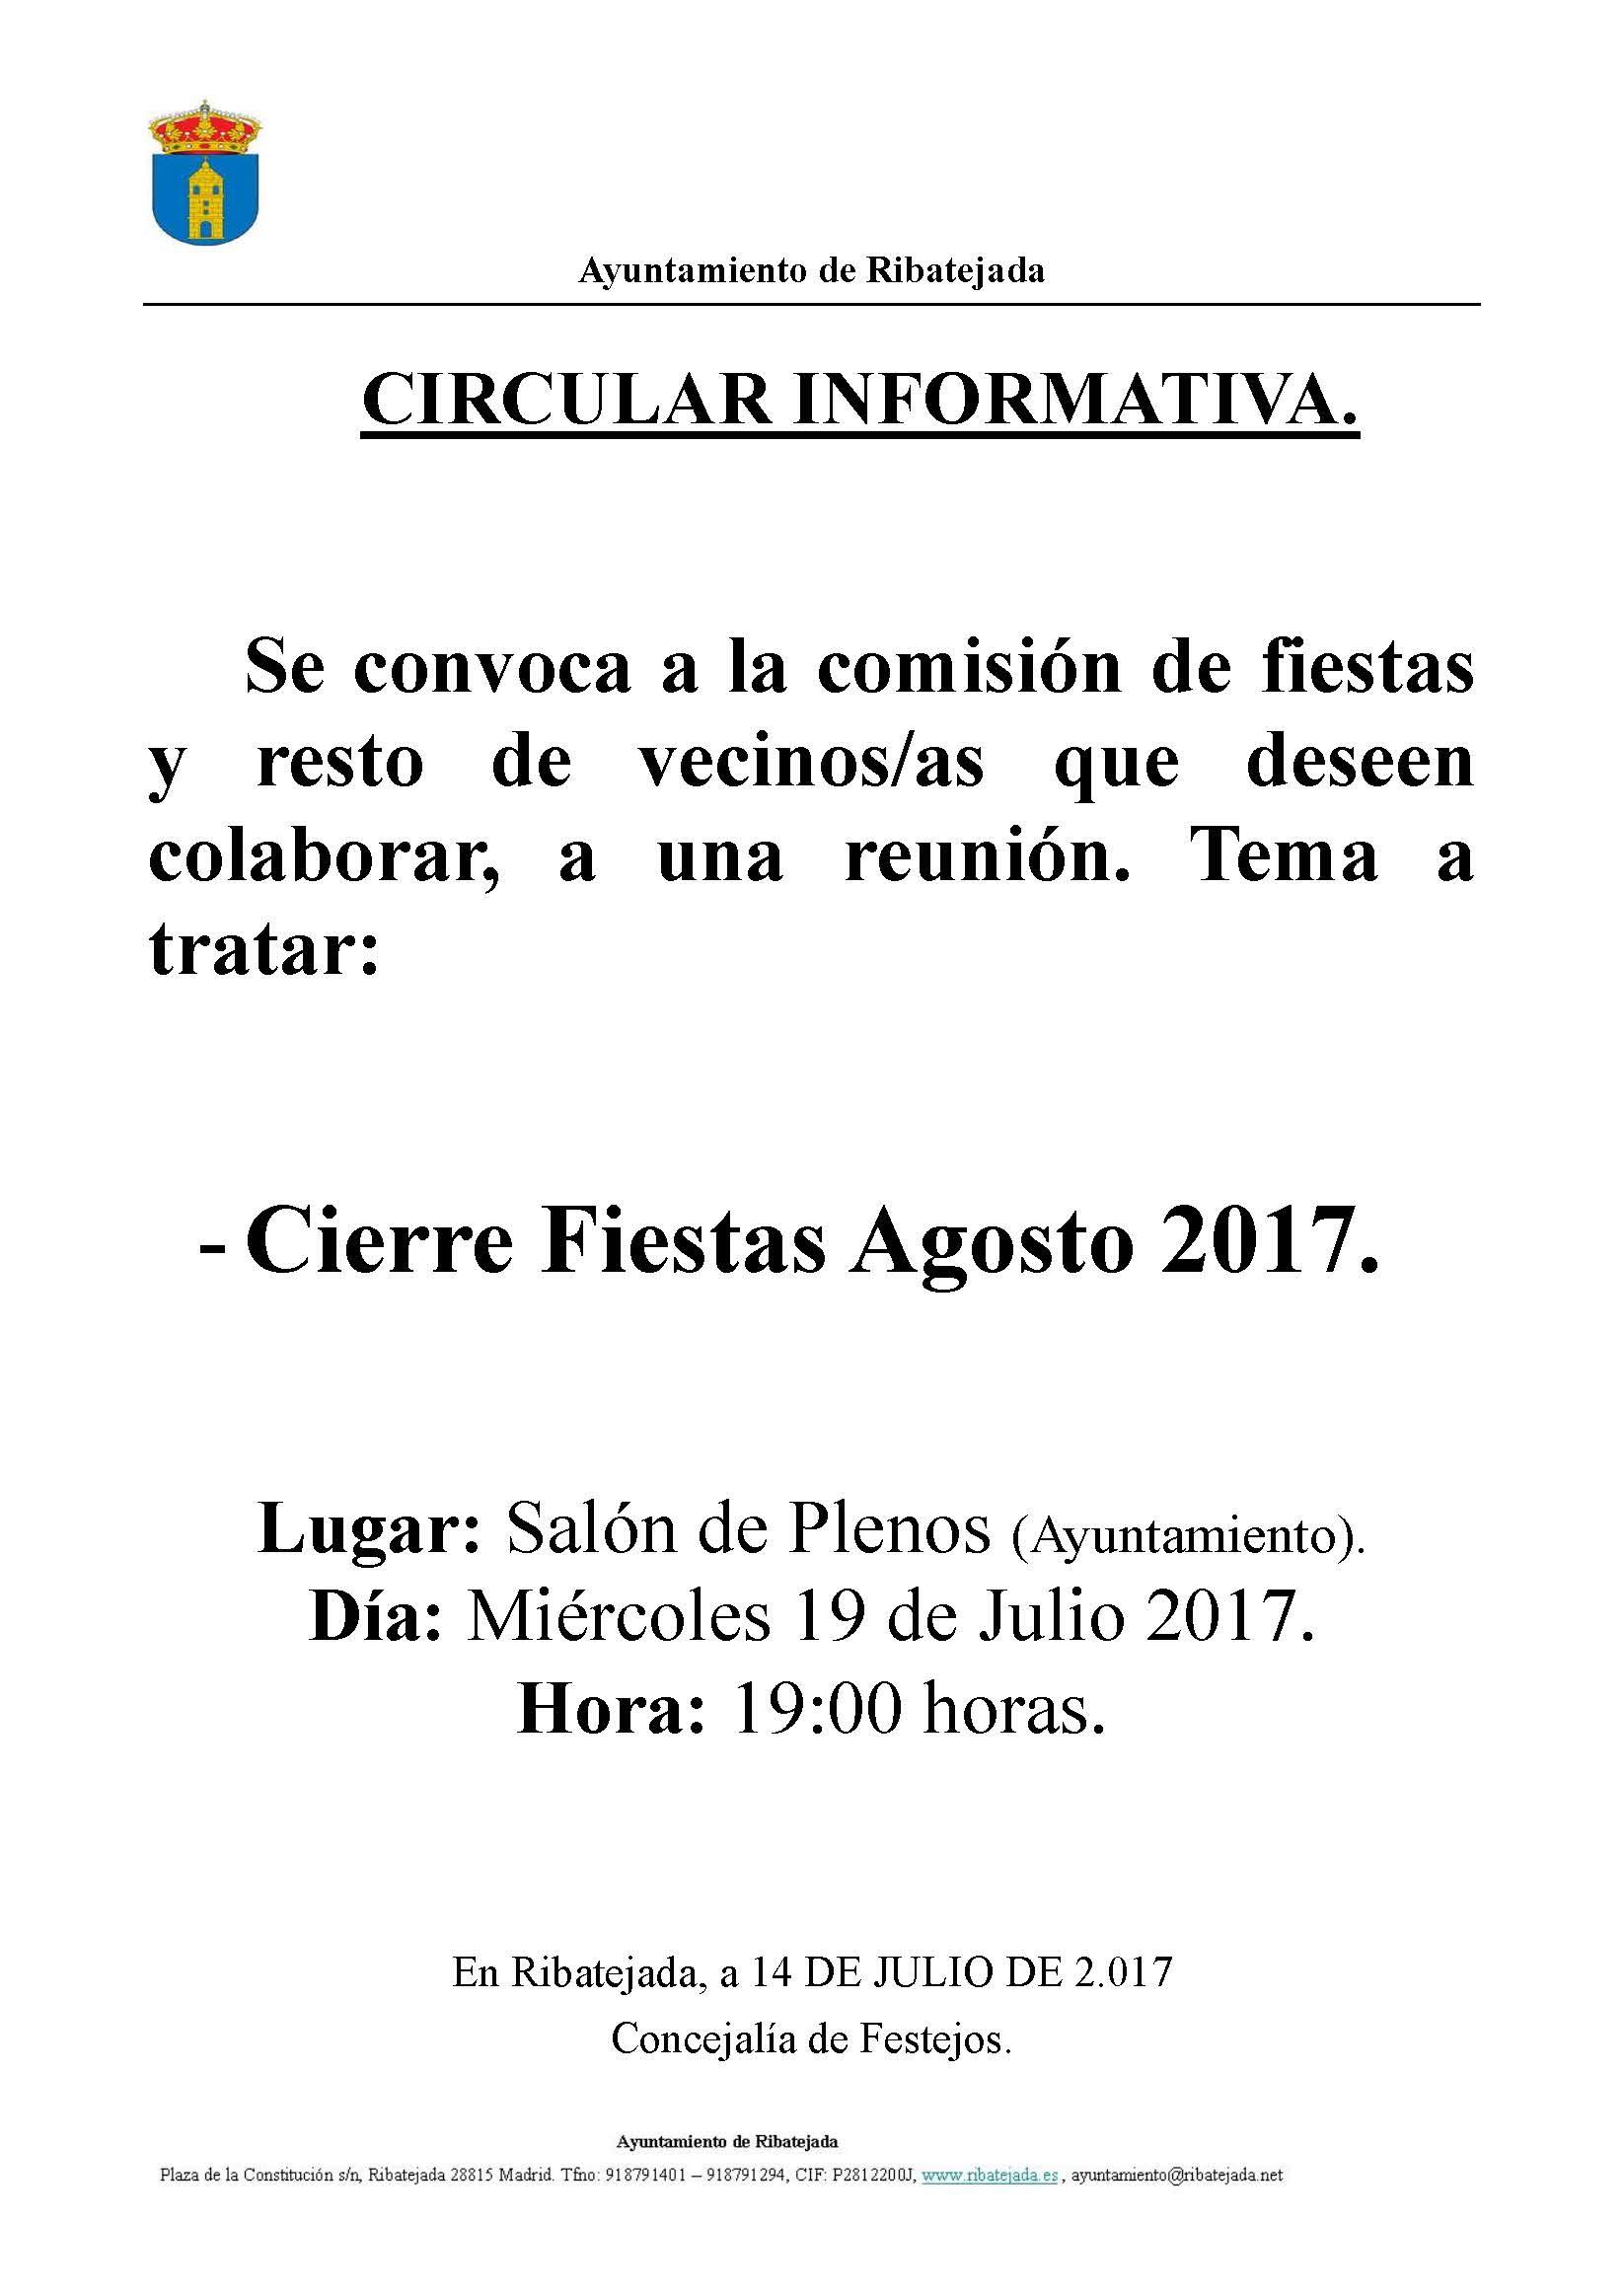 III Reunion Comision Fiestas 2017